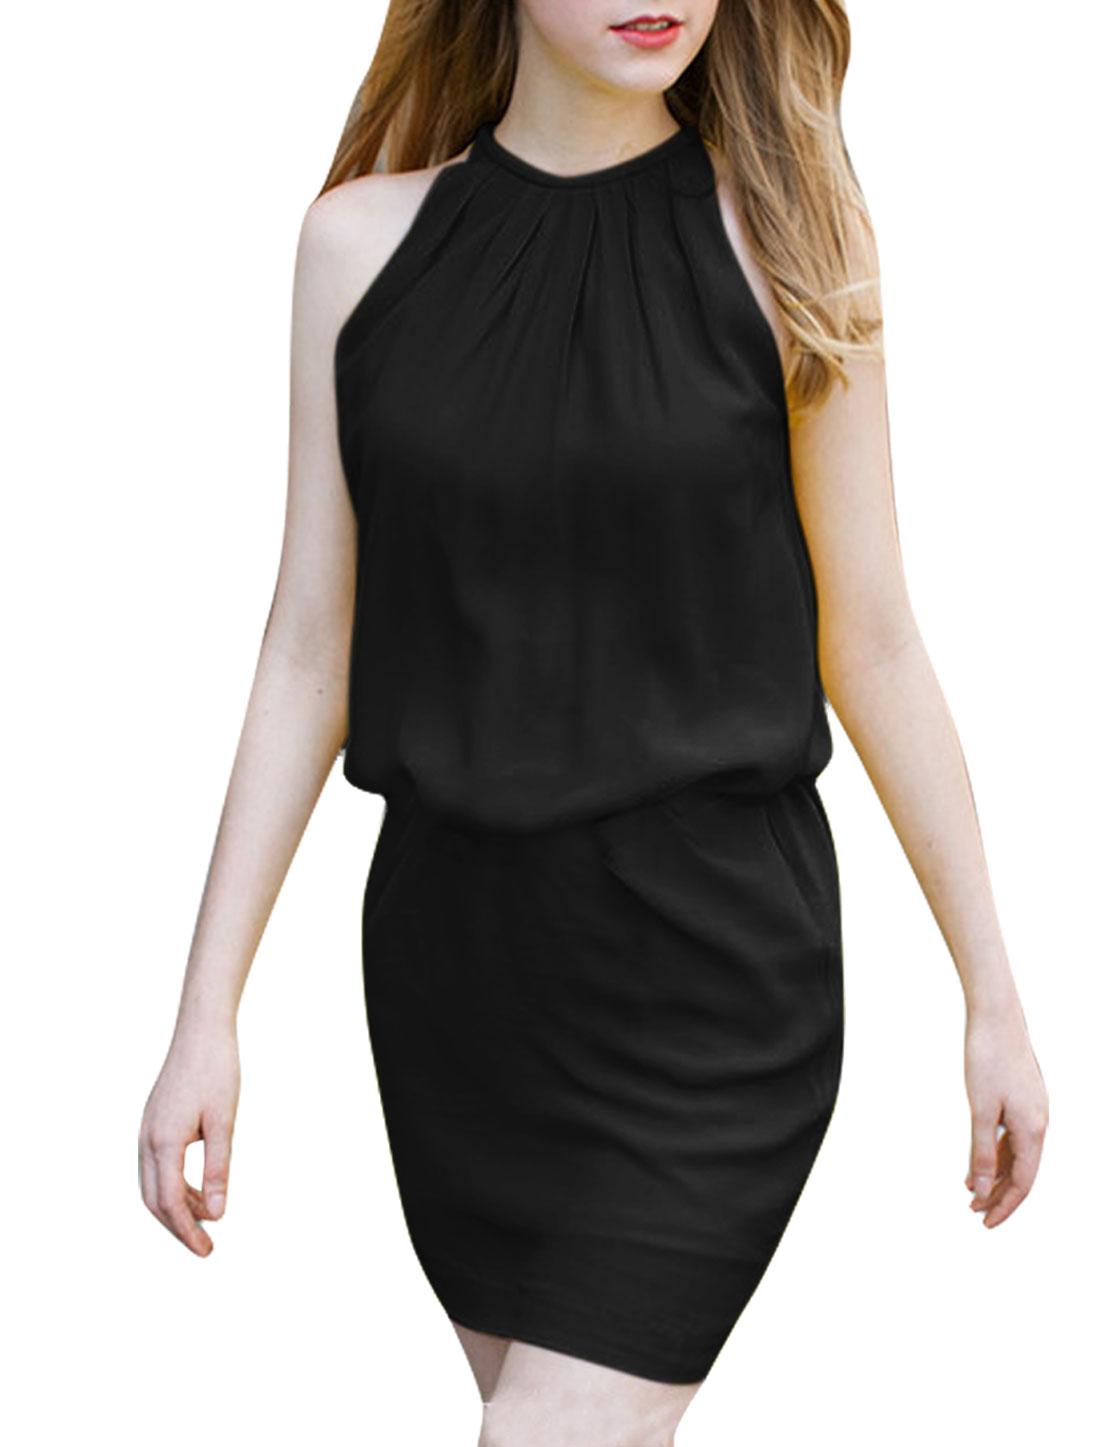 Women Halter Neck Belt Summer Wearing Dress Black L